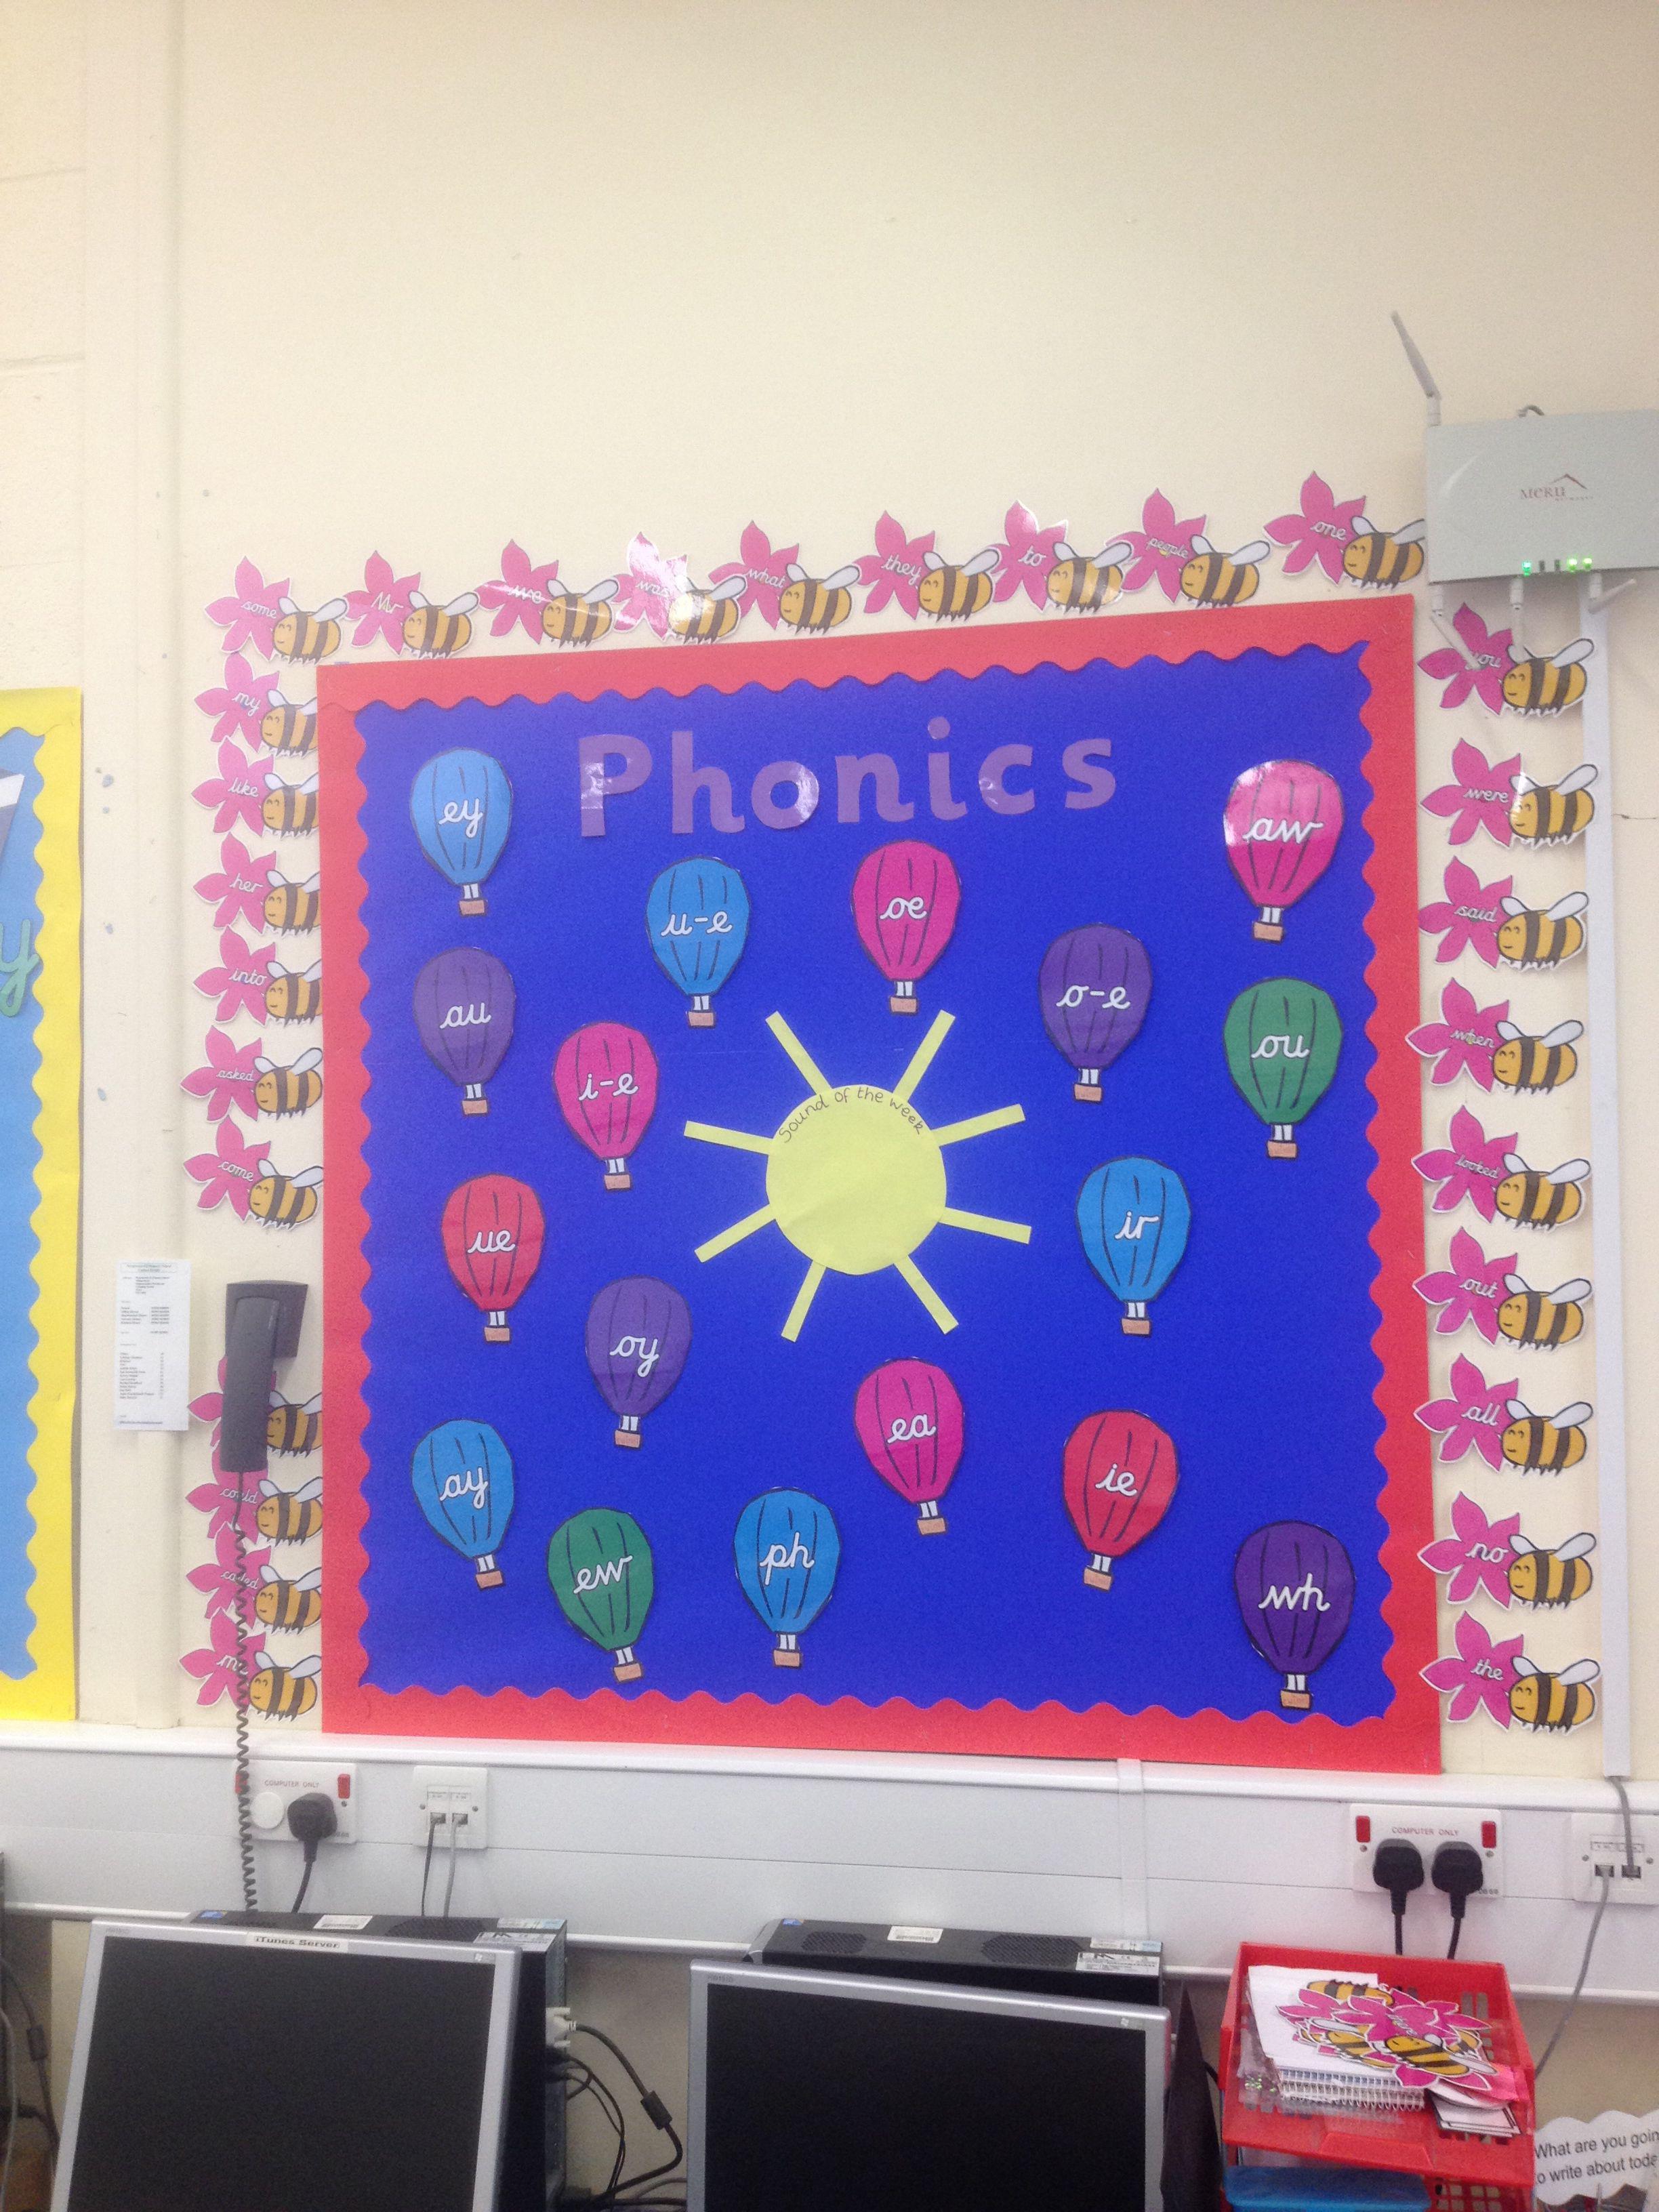 Phase 5 Phonics Display